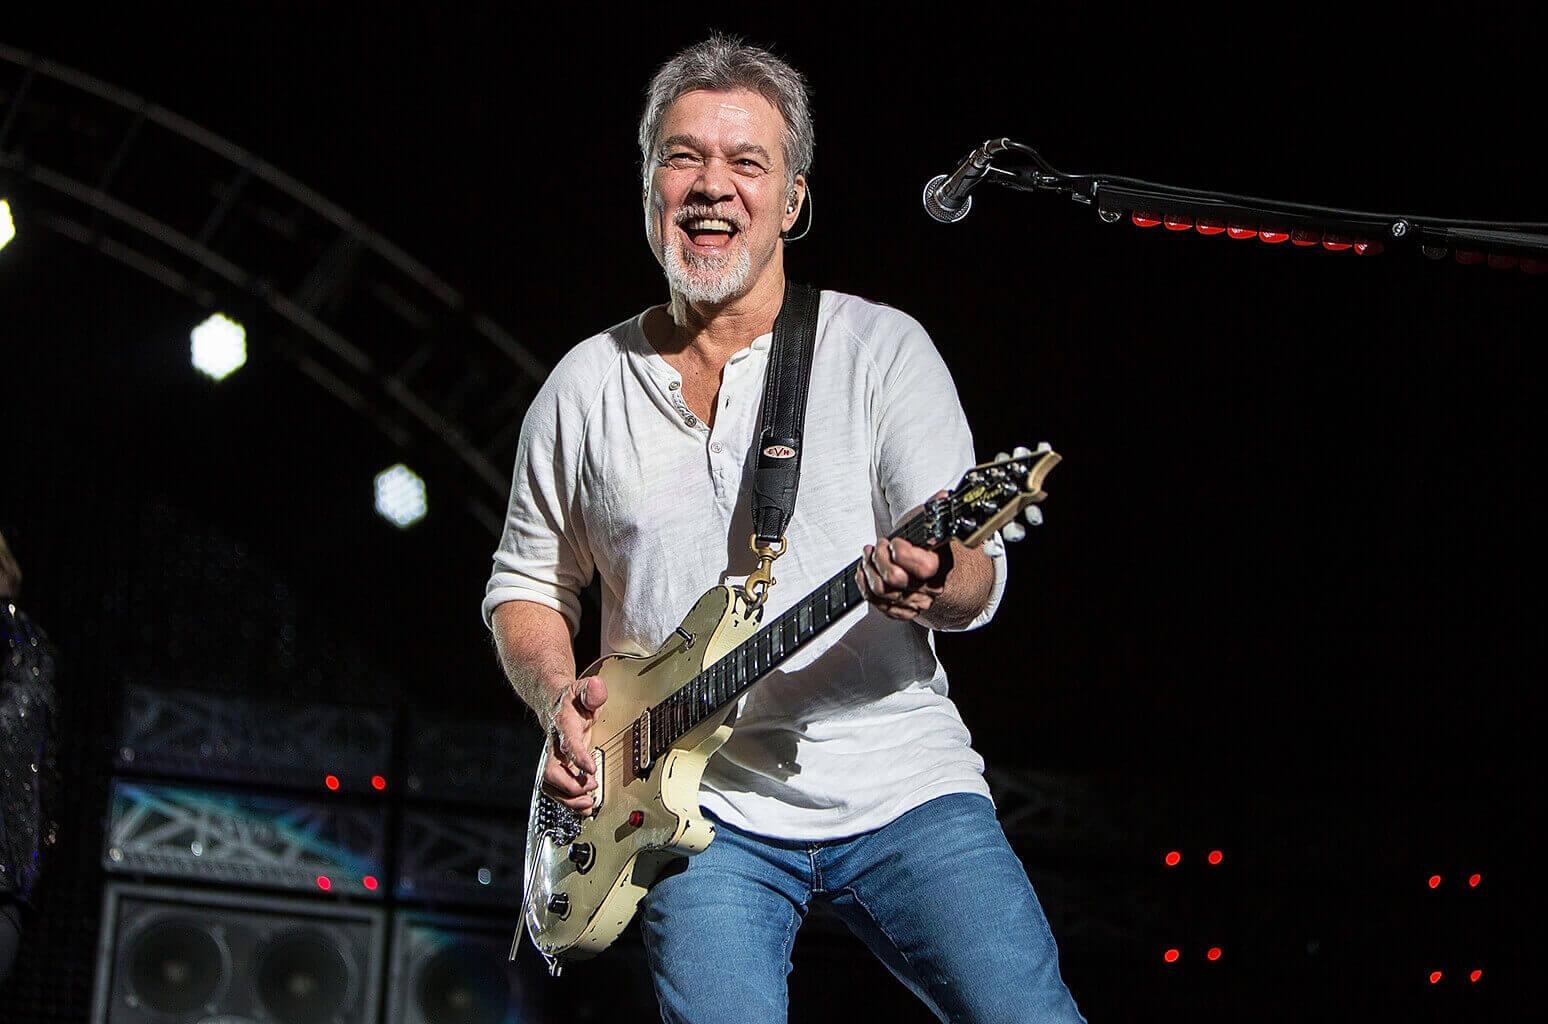 Indie Wallpaper Hd Hear Eddie Van Halen S Isolated Track On Ain T Talking